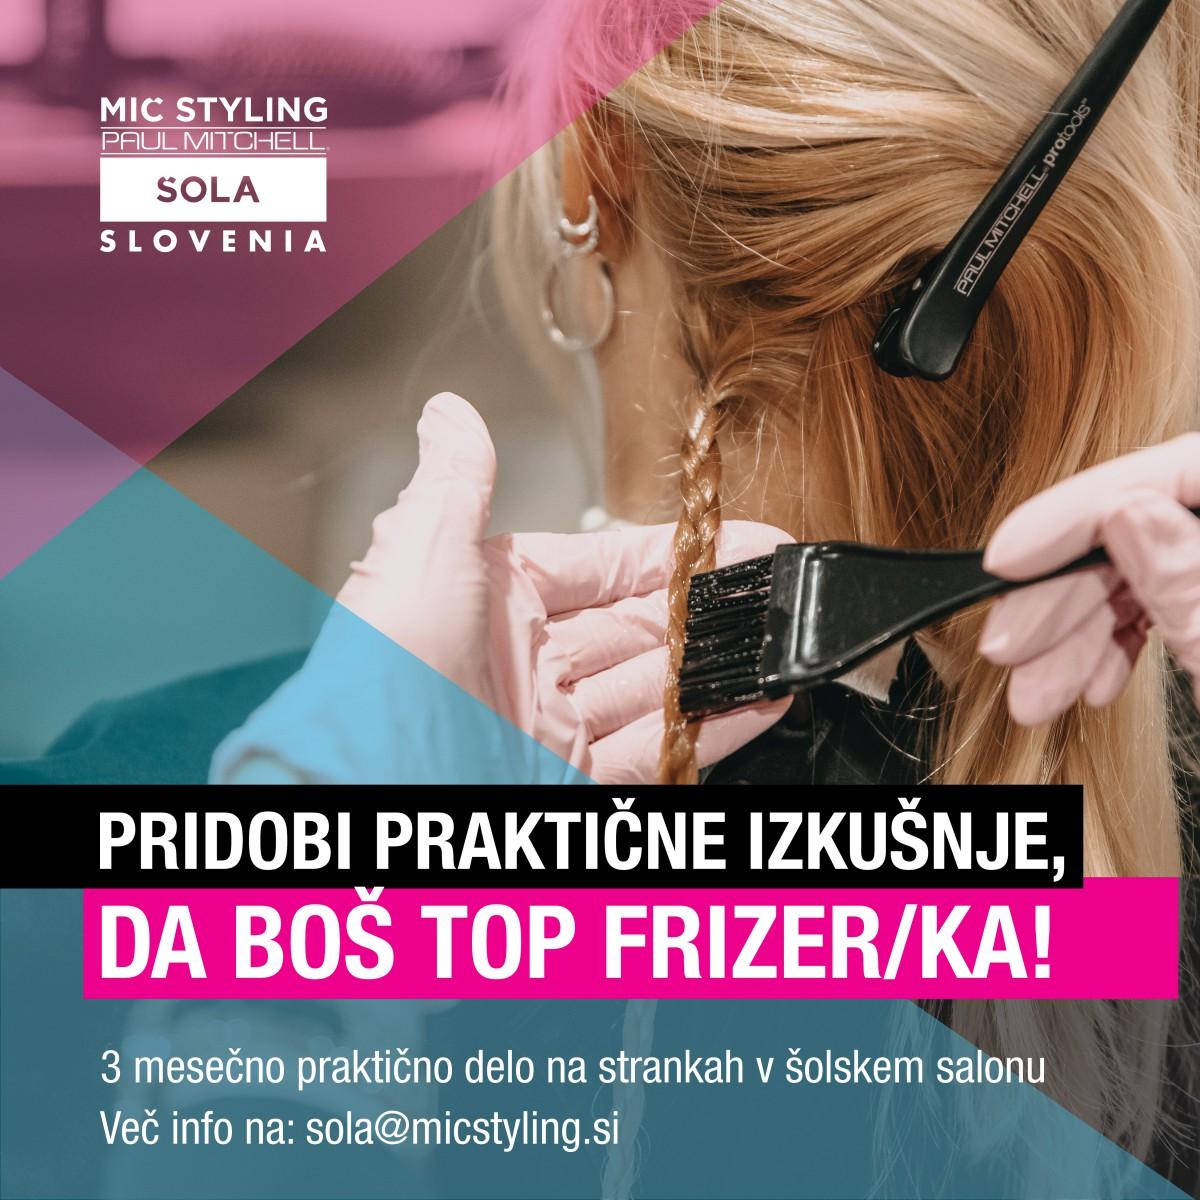 POSTANI TOP FRIZER/KA V 3 MESECIH!